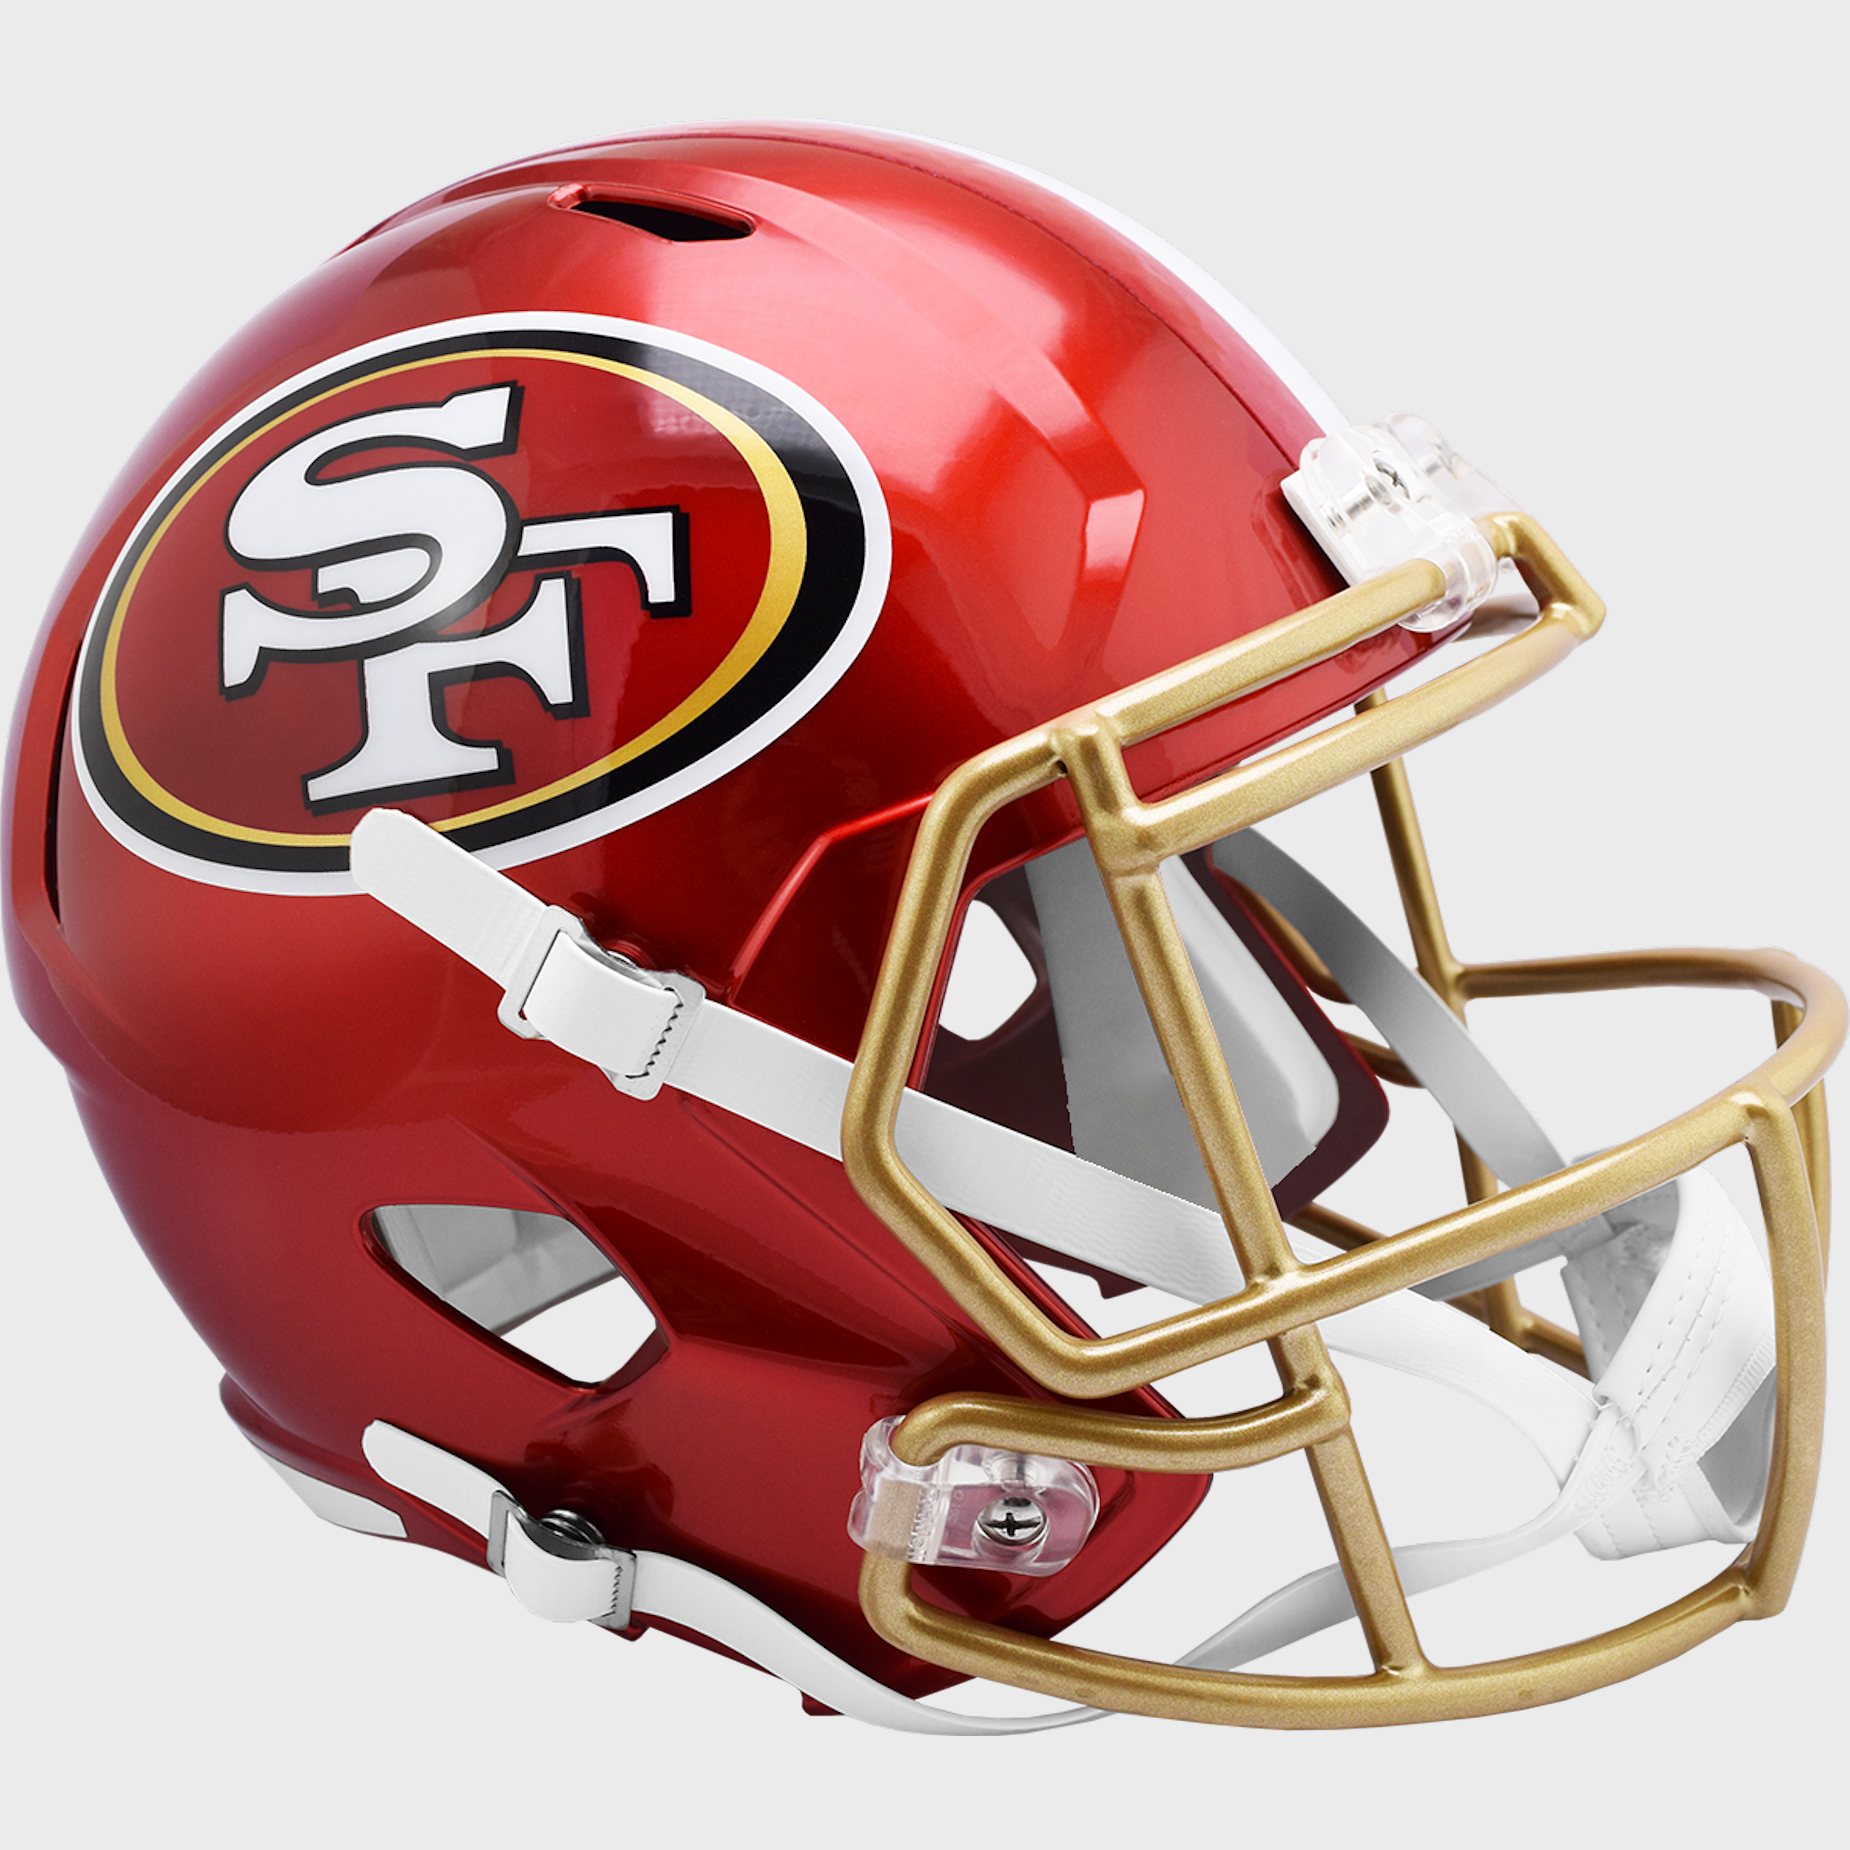 San Francisco 49ers Speed Replica Football Helmet <B>FLASH ESD 8/21/21</B>